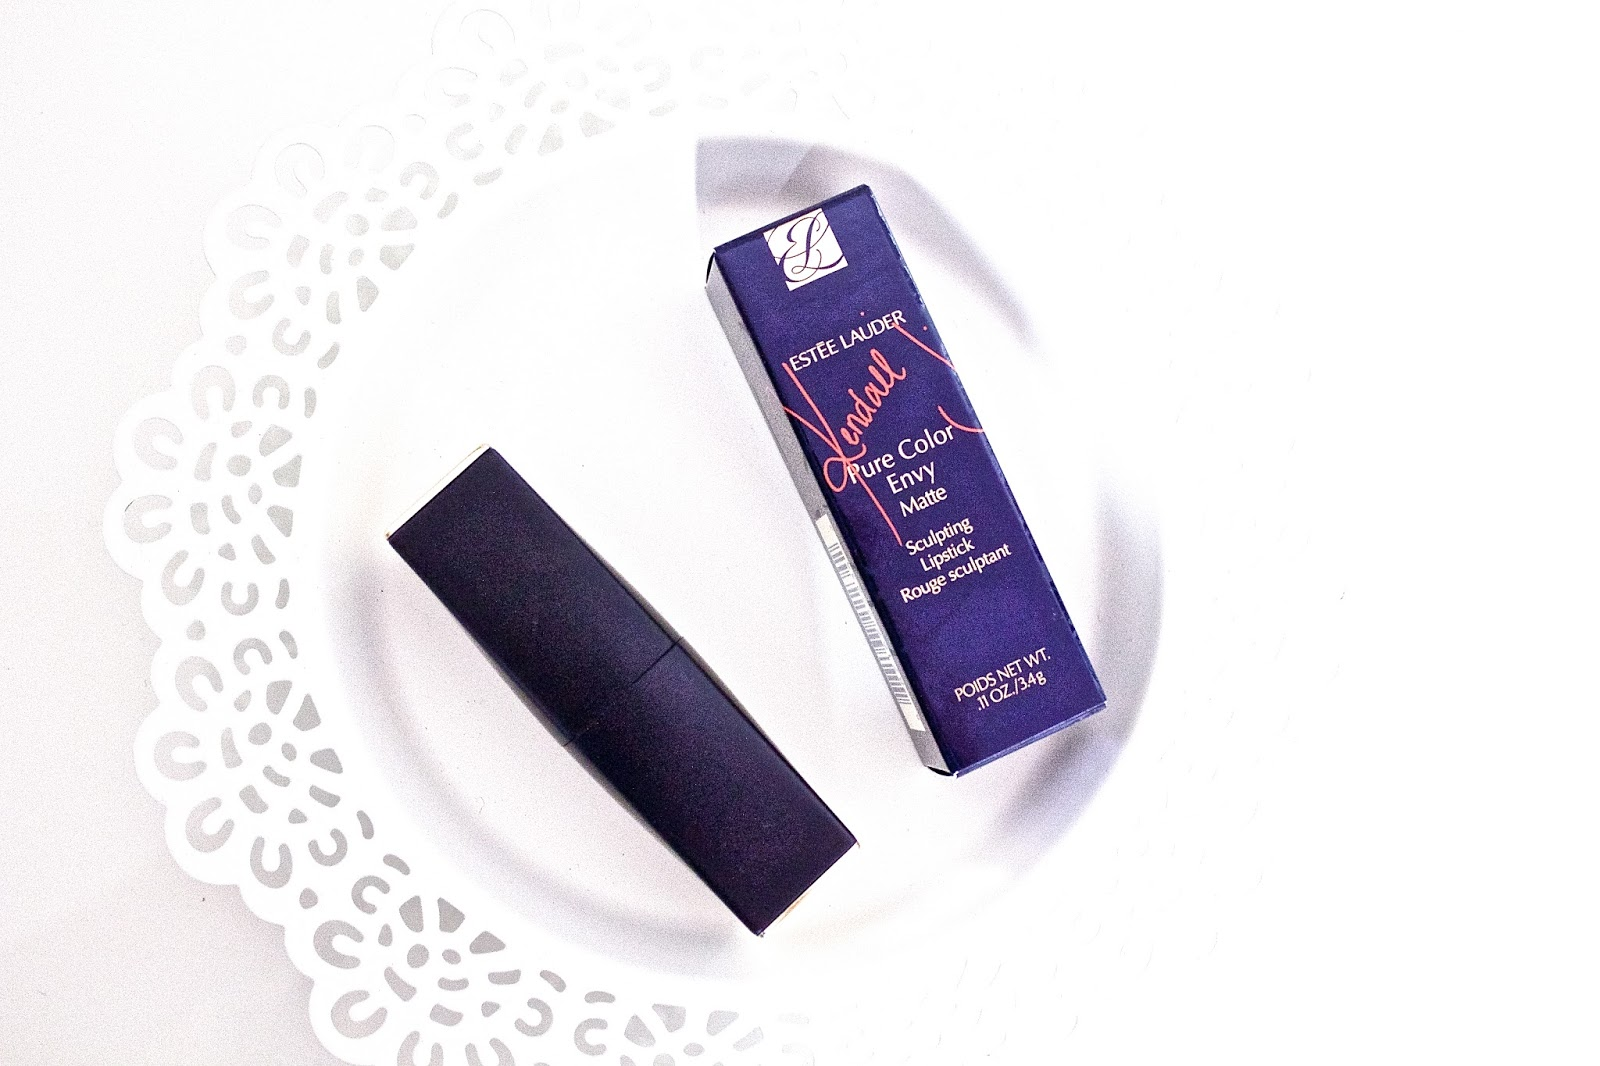 Estee Lauder Lipstick | Kendall Jenner's Shade